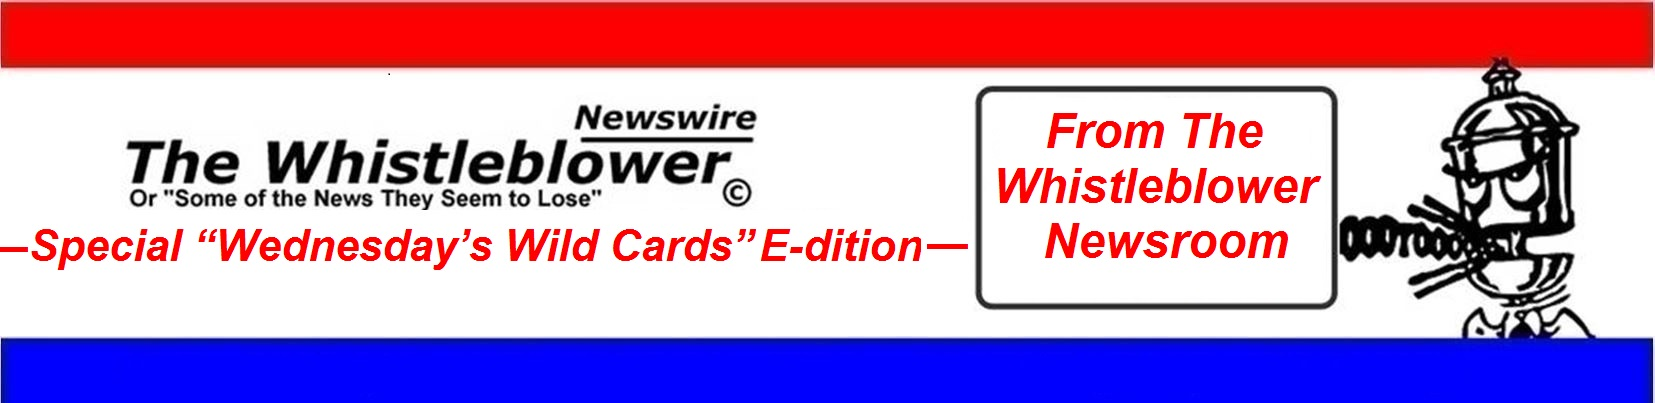 FEB 24 WEDNESDAY WILD CARDS